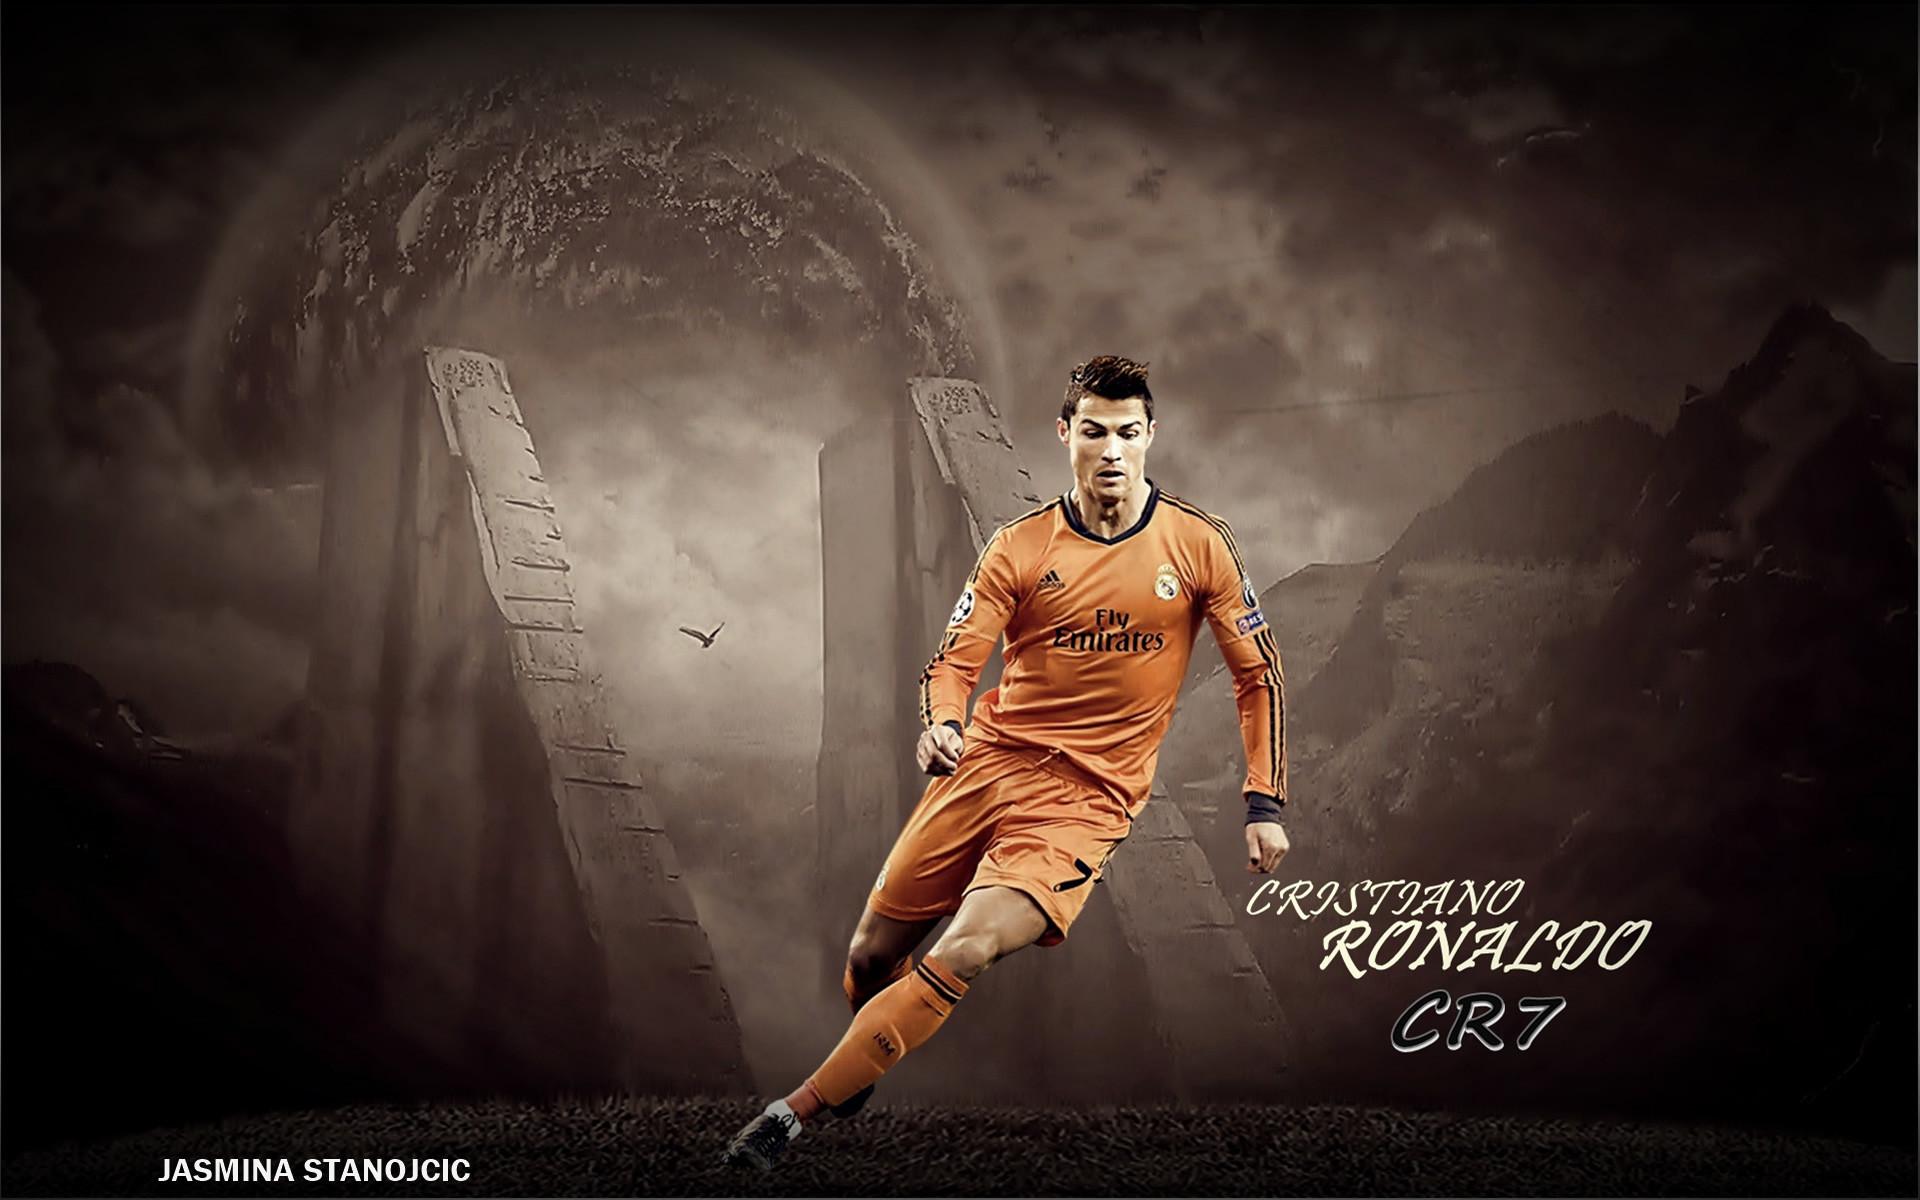 Cristiano Ronaldo Real Madrid HD desktop wallpaper 1024×576 Images Of Cristiano  Ronaldo Wallpapers (